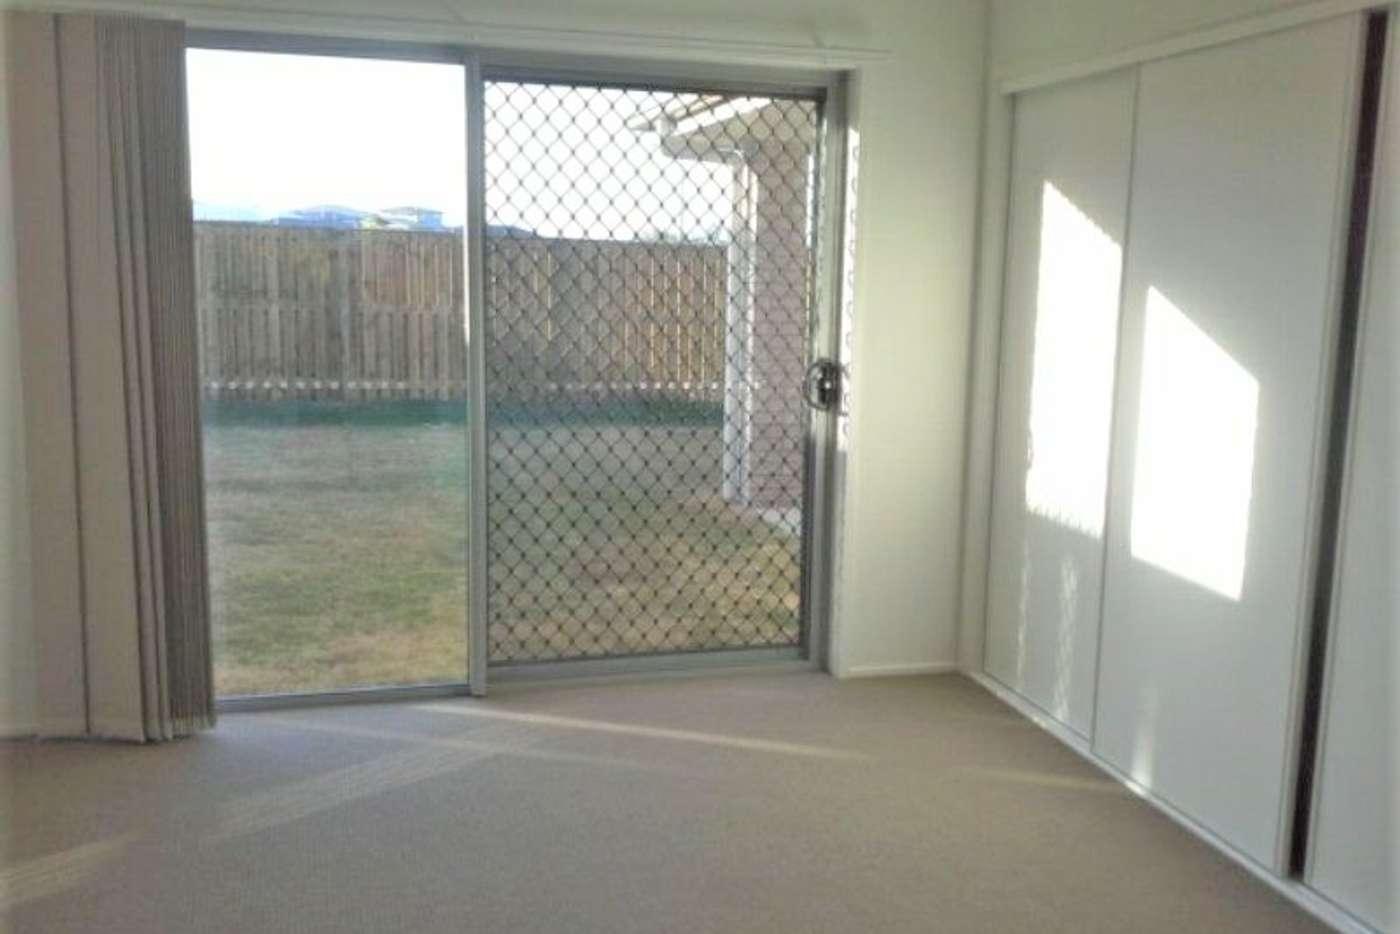 Seventh view of Homely house listing, 2 Josephine Street, Boyne Island QLD 4680